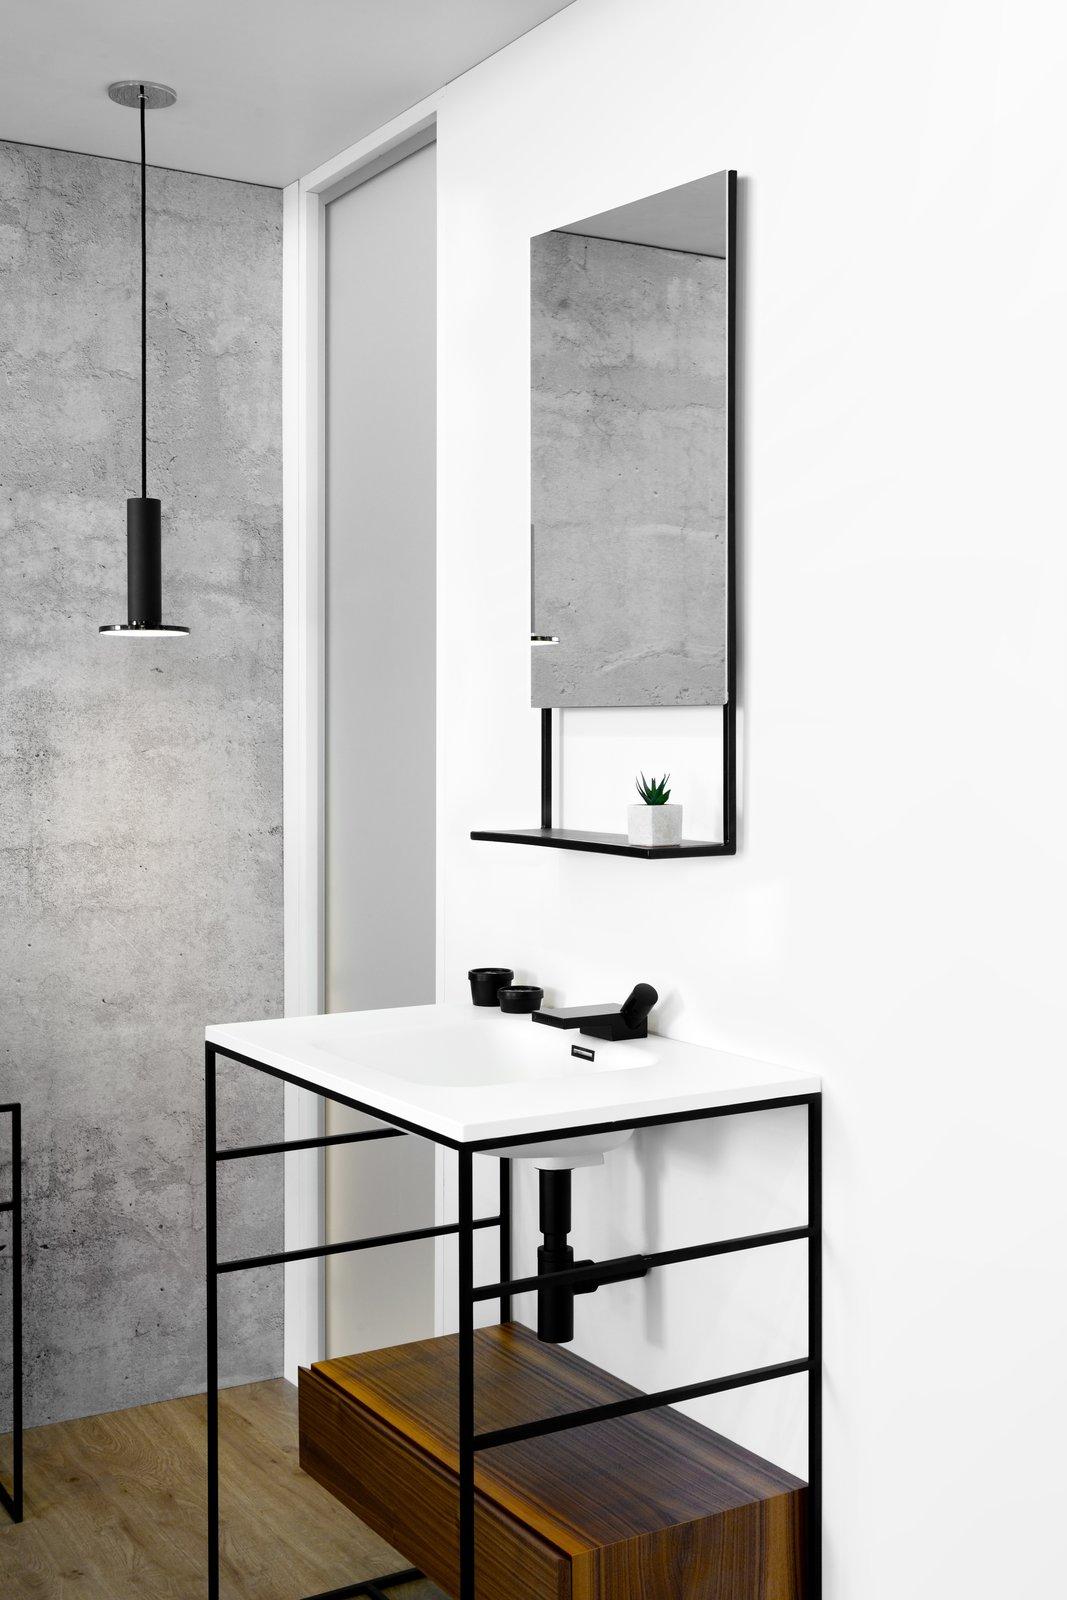 Bath Room Medium Hardwood Floor Wall Mount Sink And Pendant Lighting This